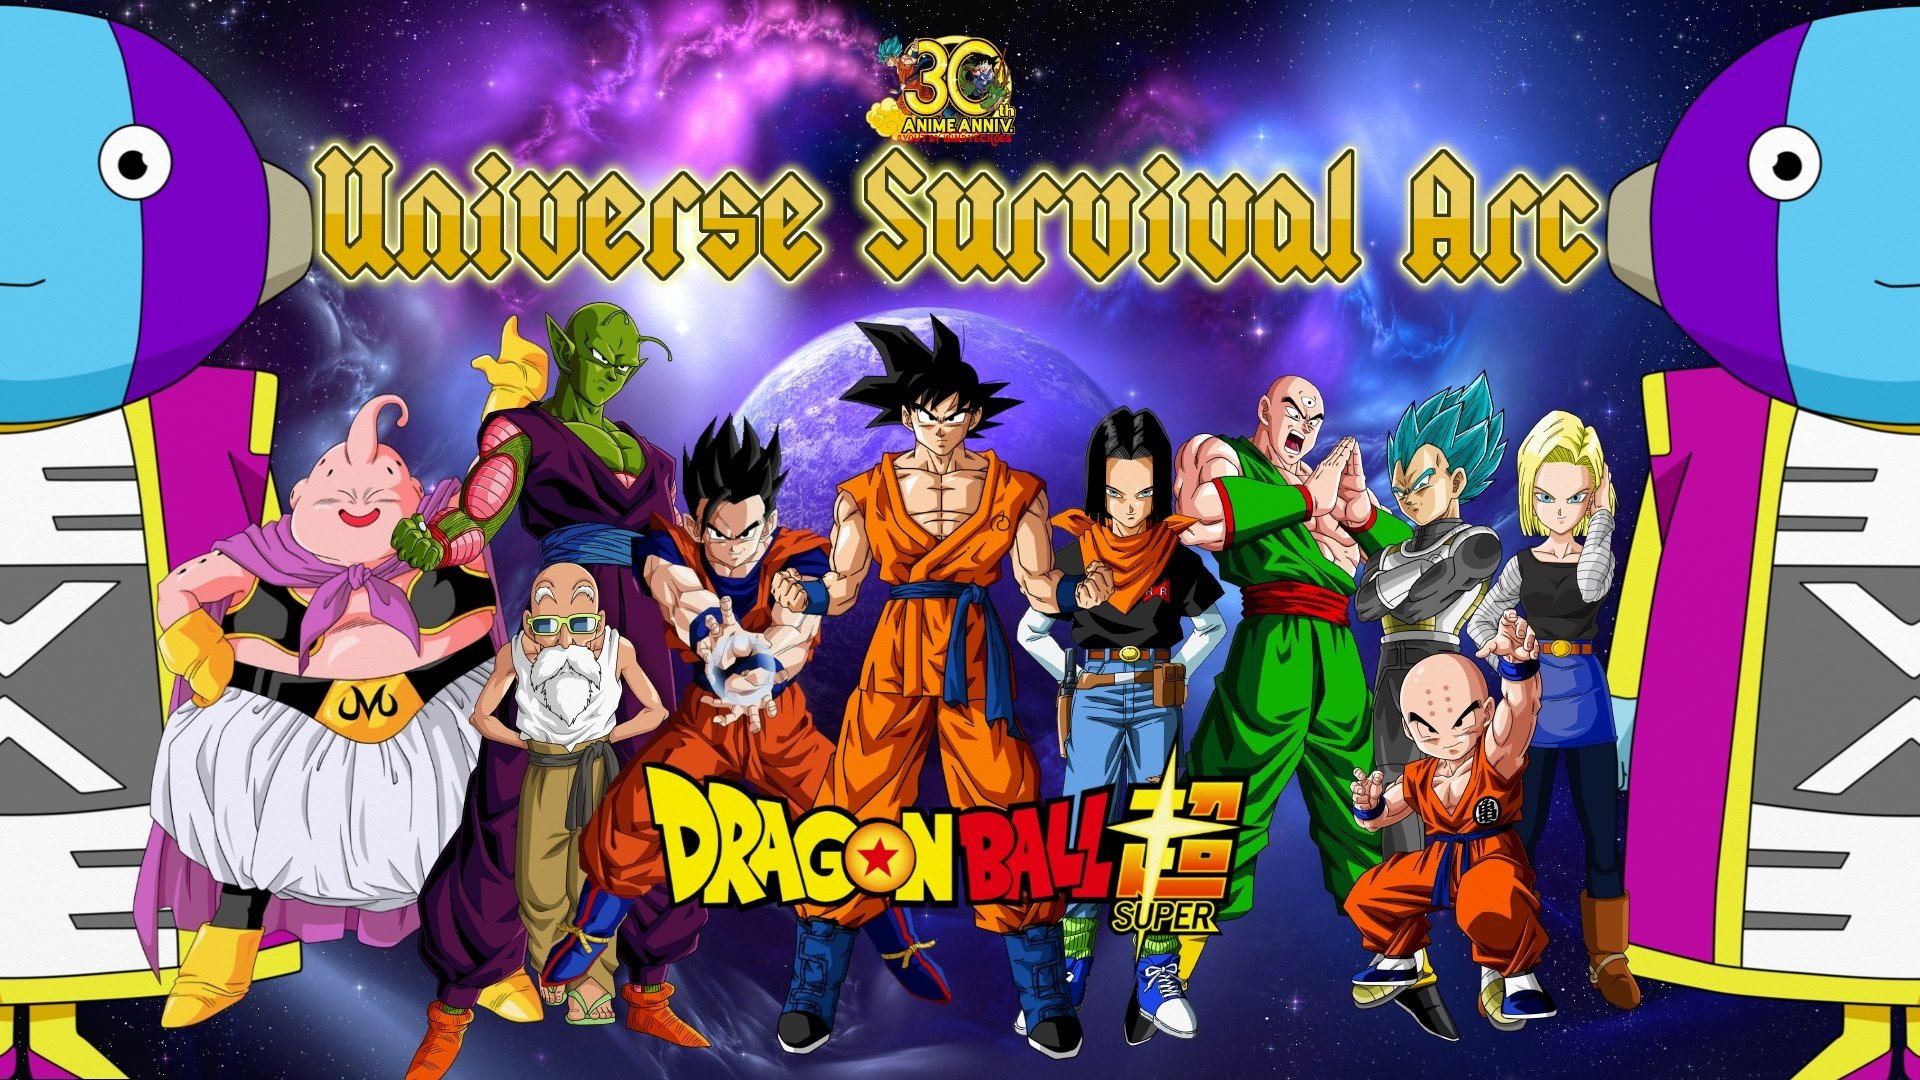 Universe Survival Arc Hd Wallpaper Background Image 1920x1080